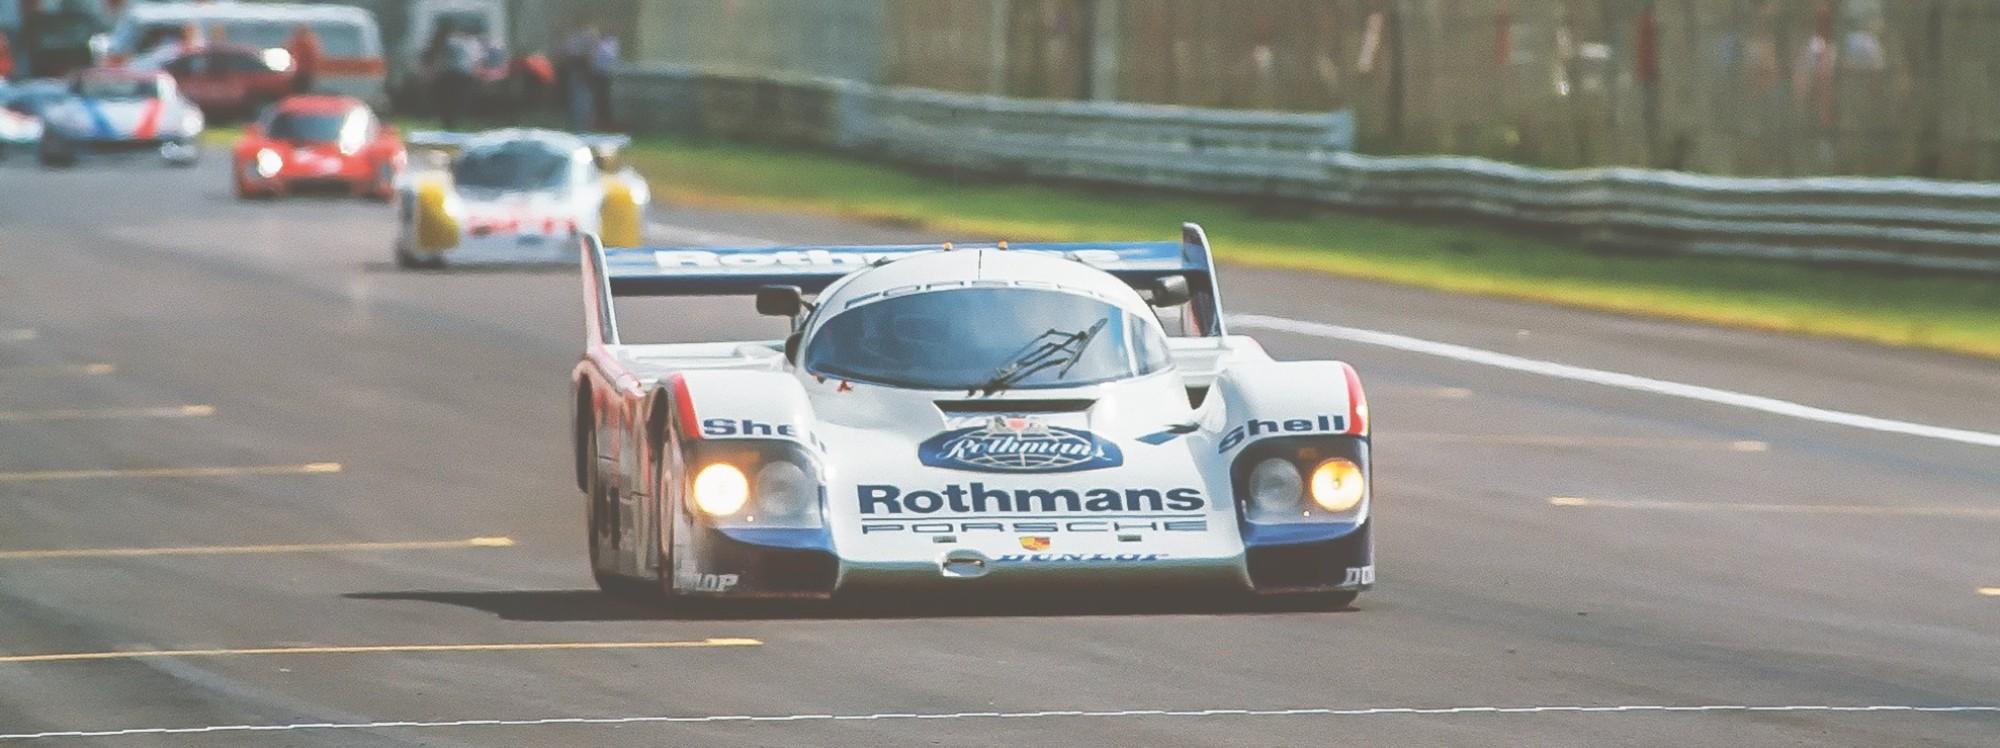 La historia de la caja de cambios de doble embrague de Porsche